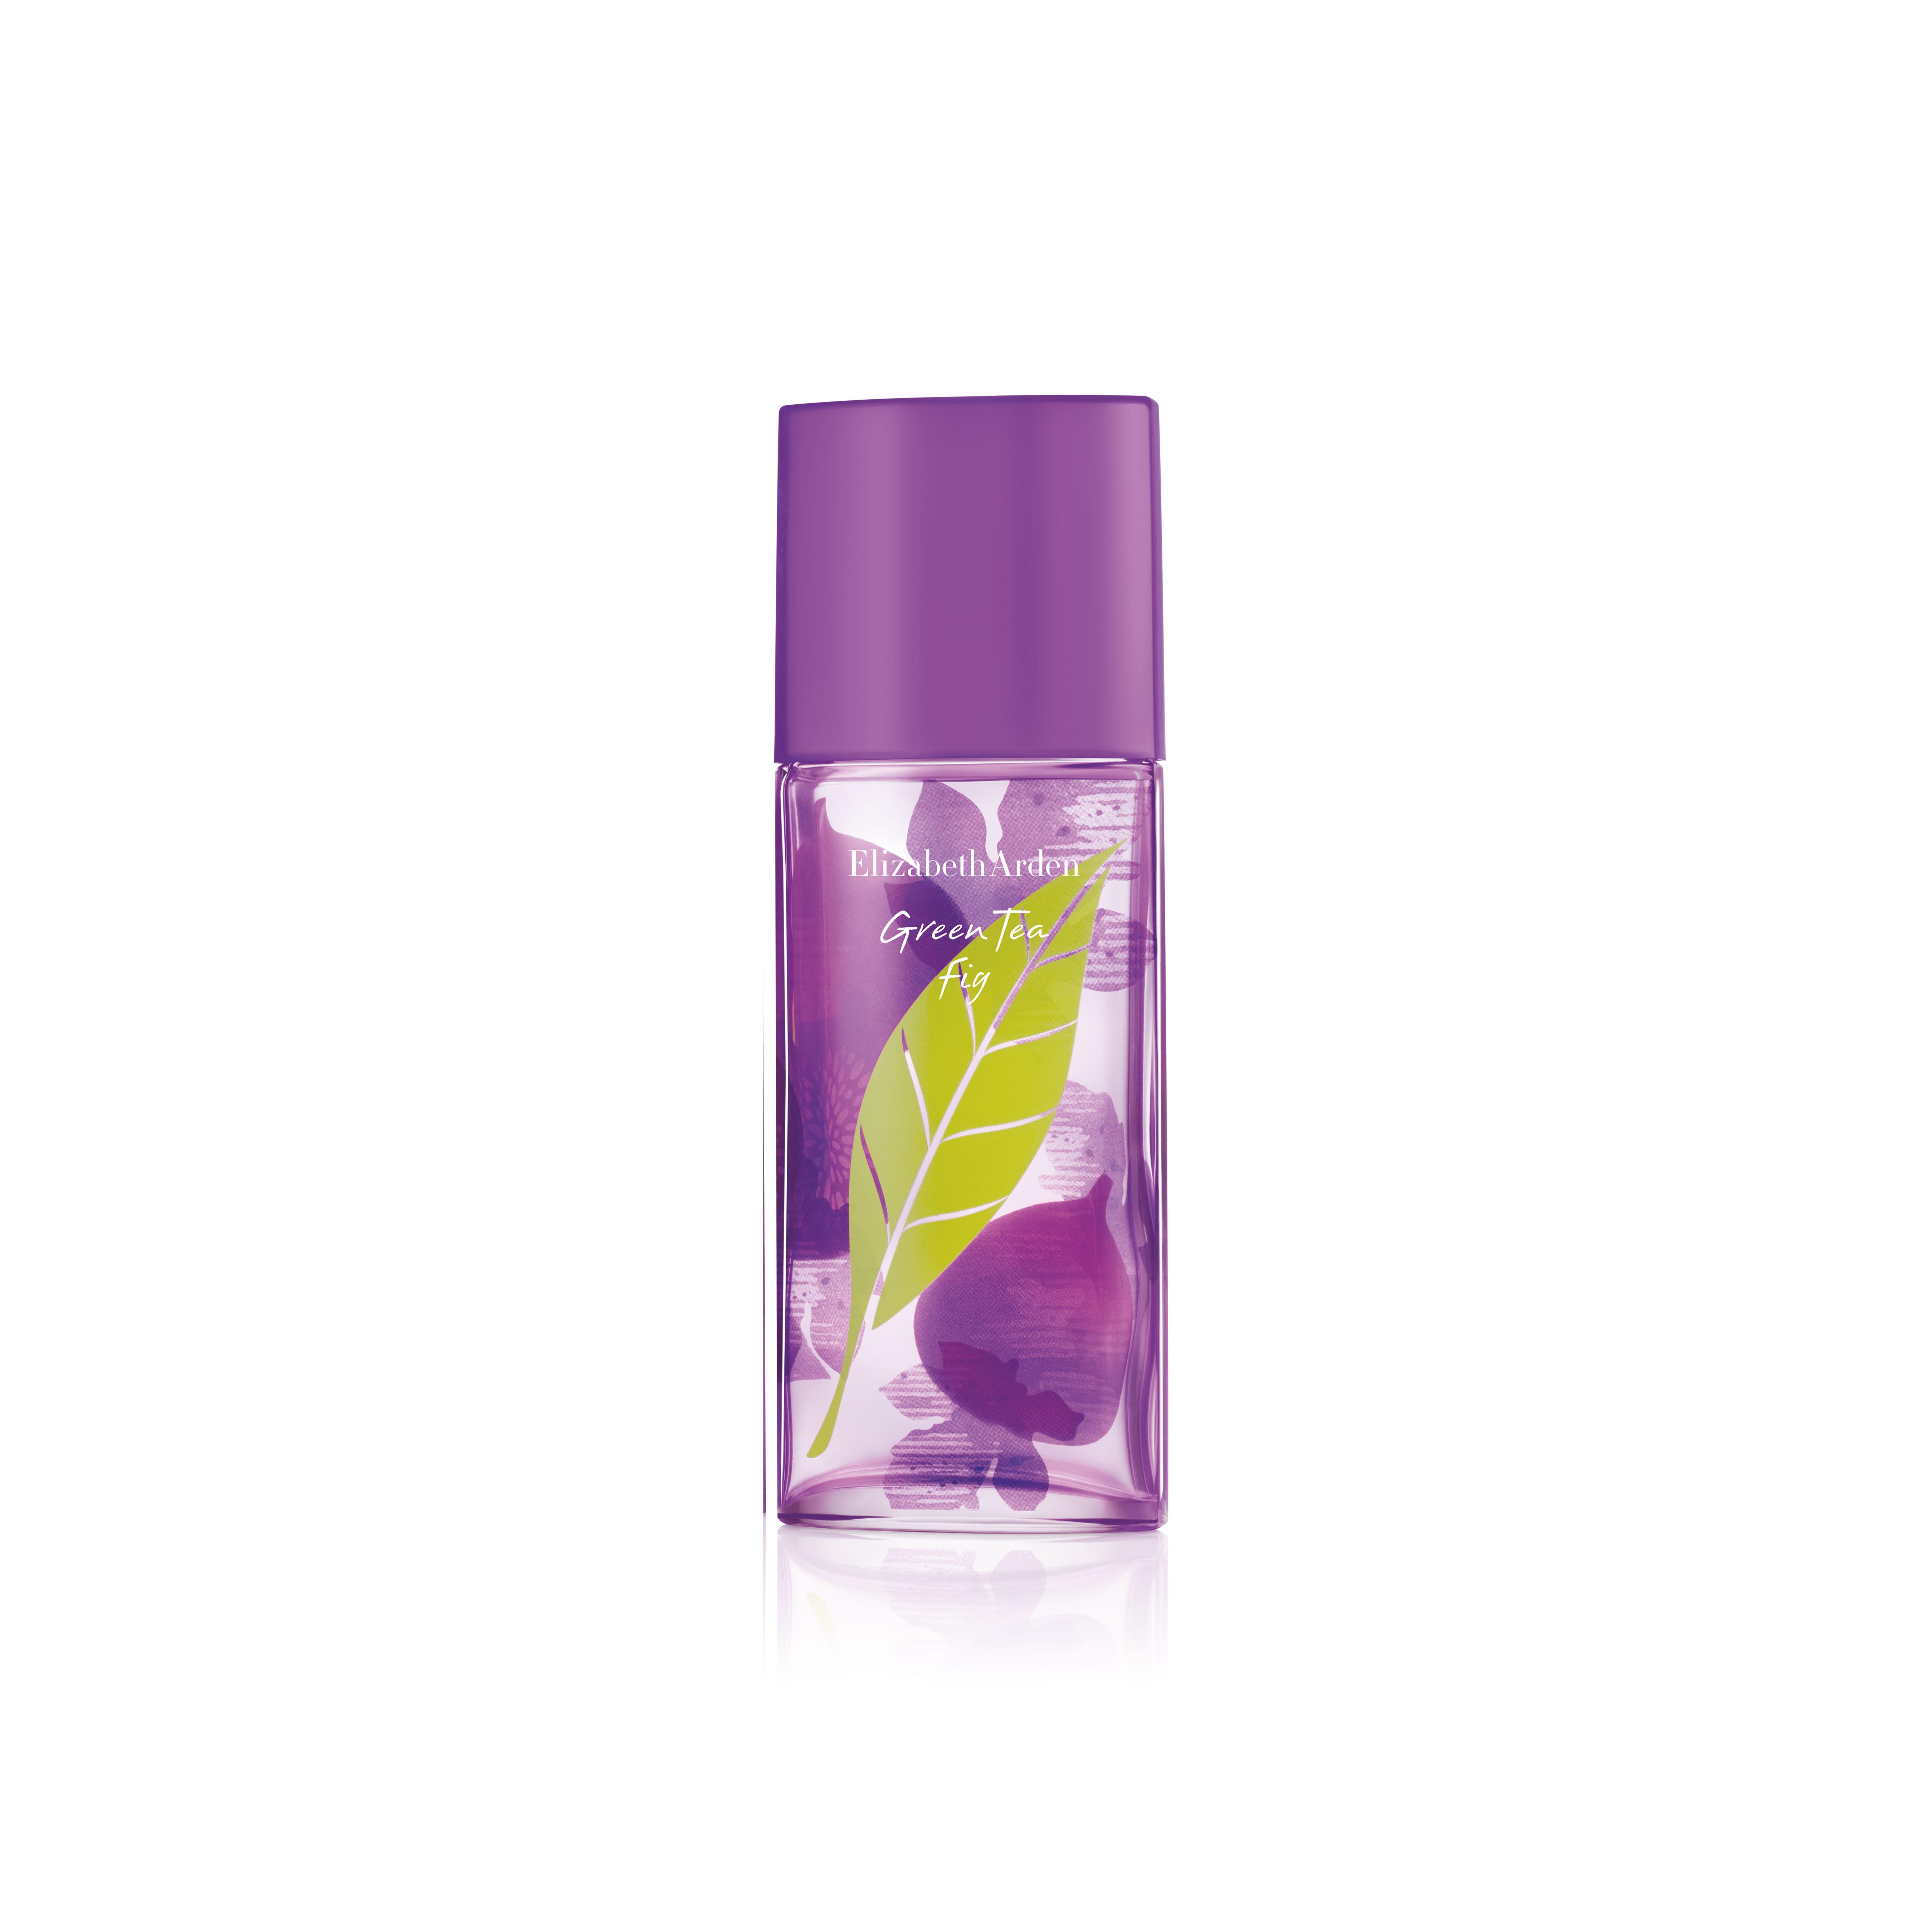 Green Tea Fig Edt 50ml